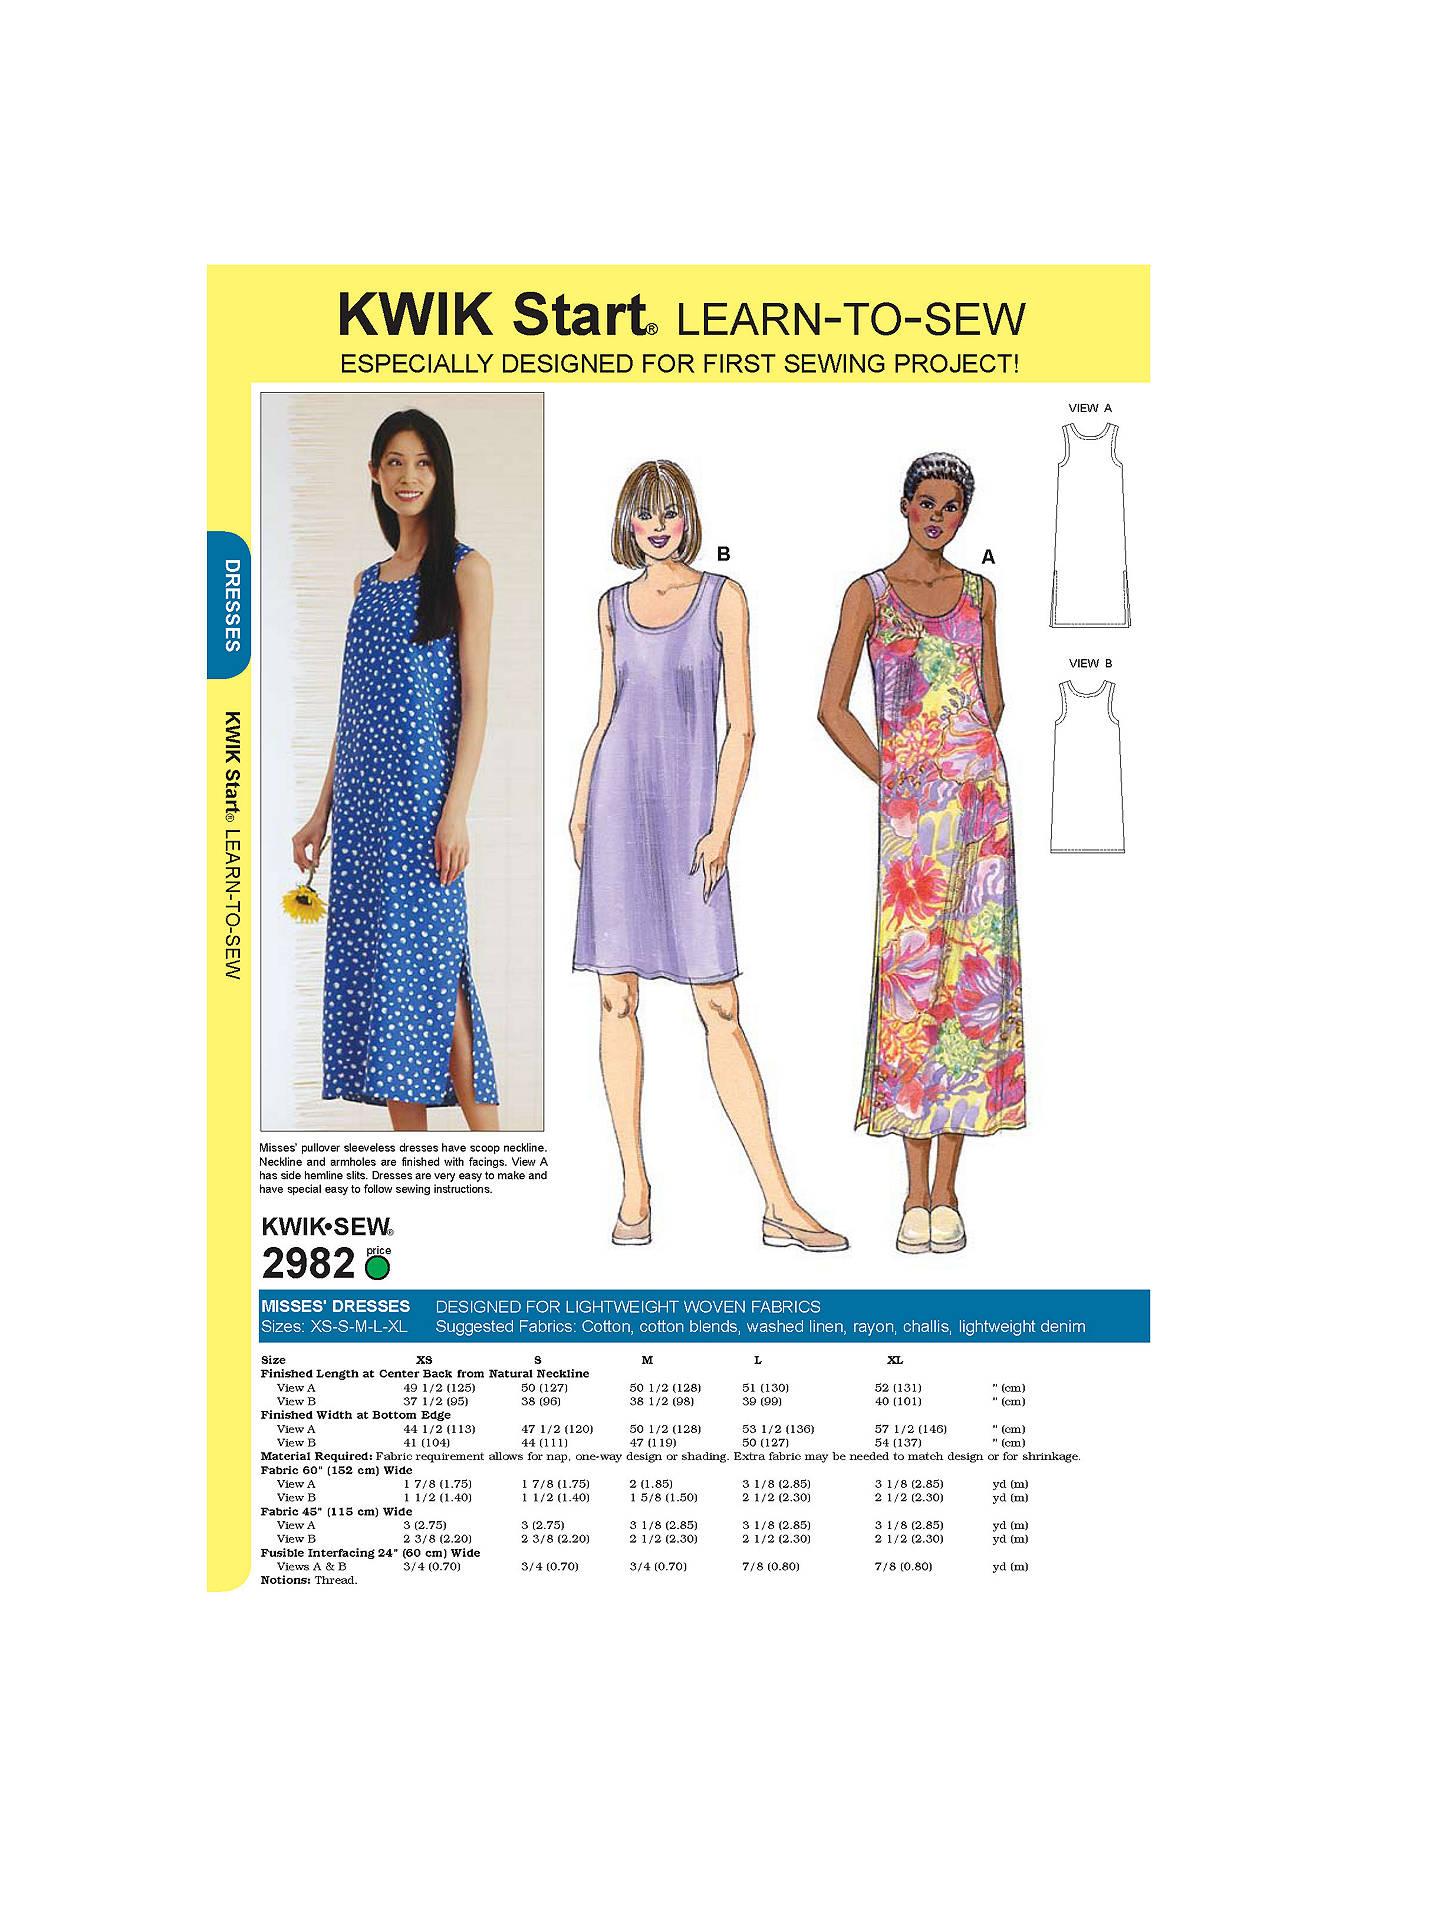 Kwik Sew Learn-To-Sew Dress Sewing Patterns, 2982 at John Lewis ...